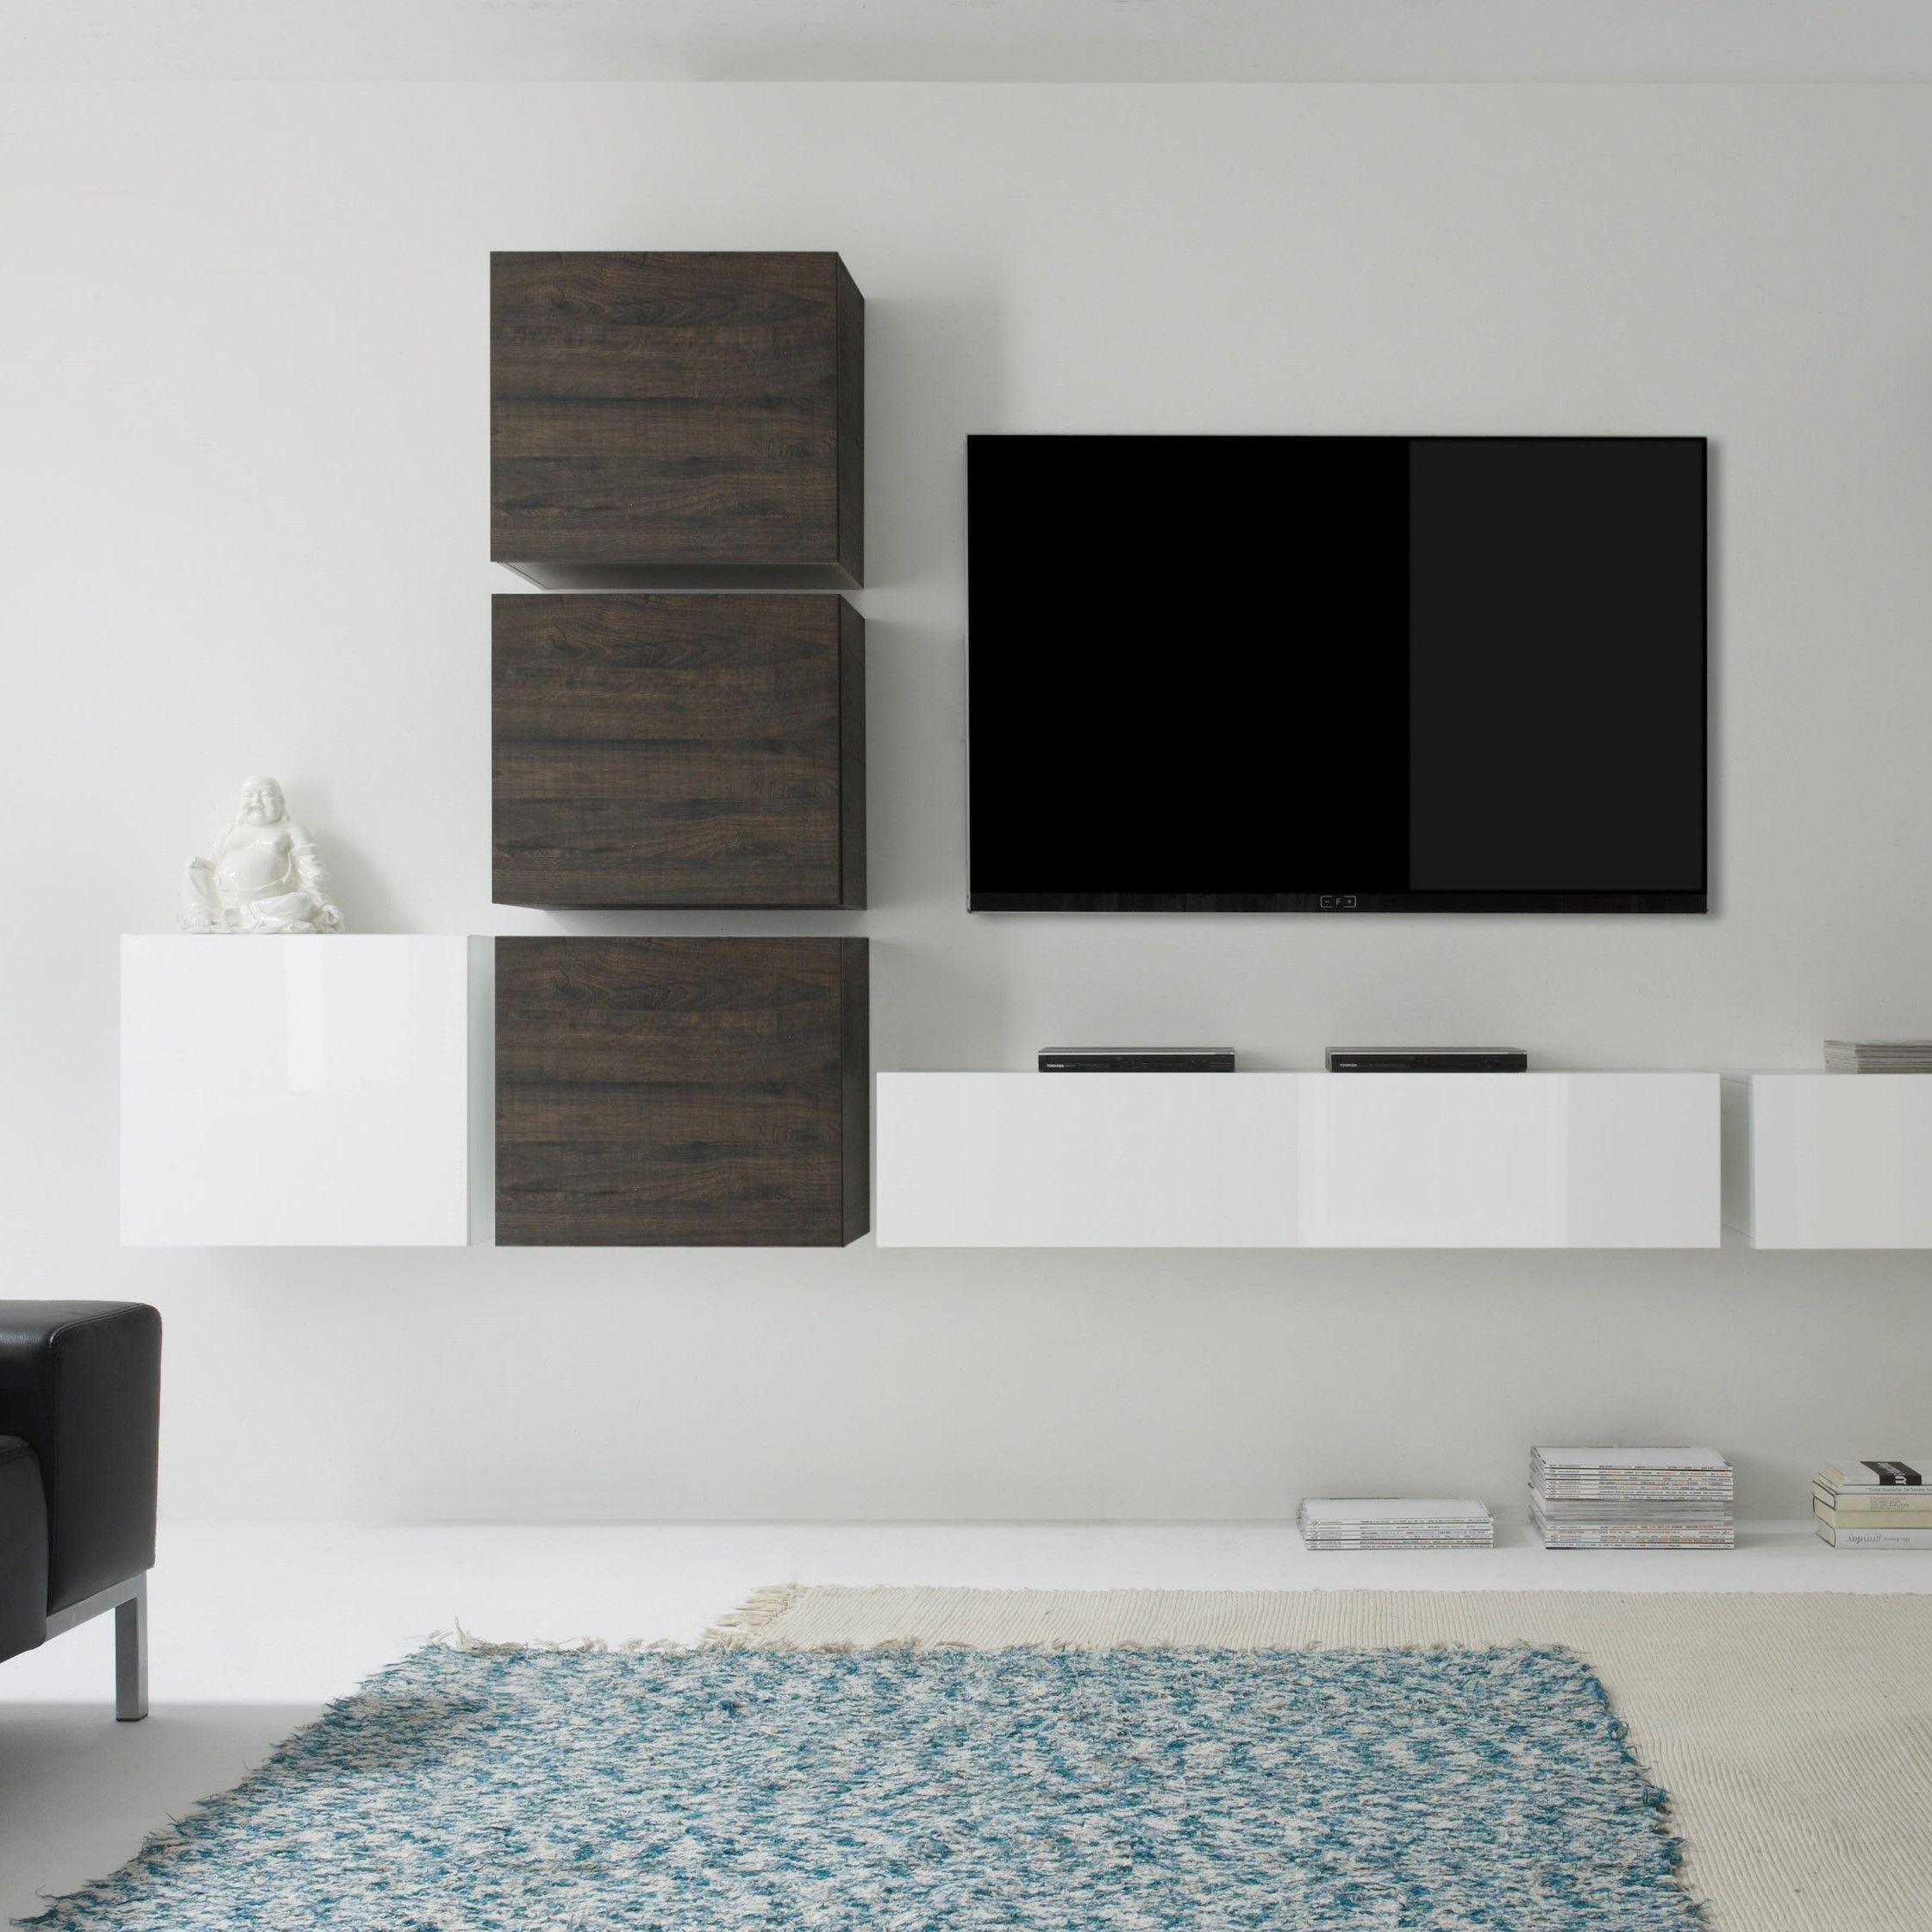 Neu Wohnwand Modern Ebay Wohnwand Hochglanz Wohnwand Modern